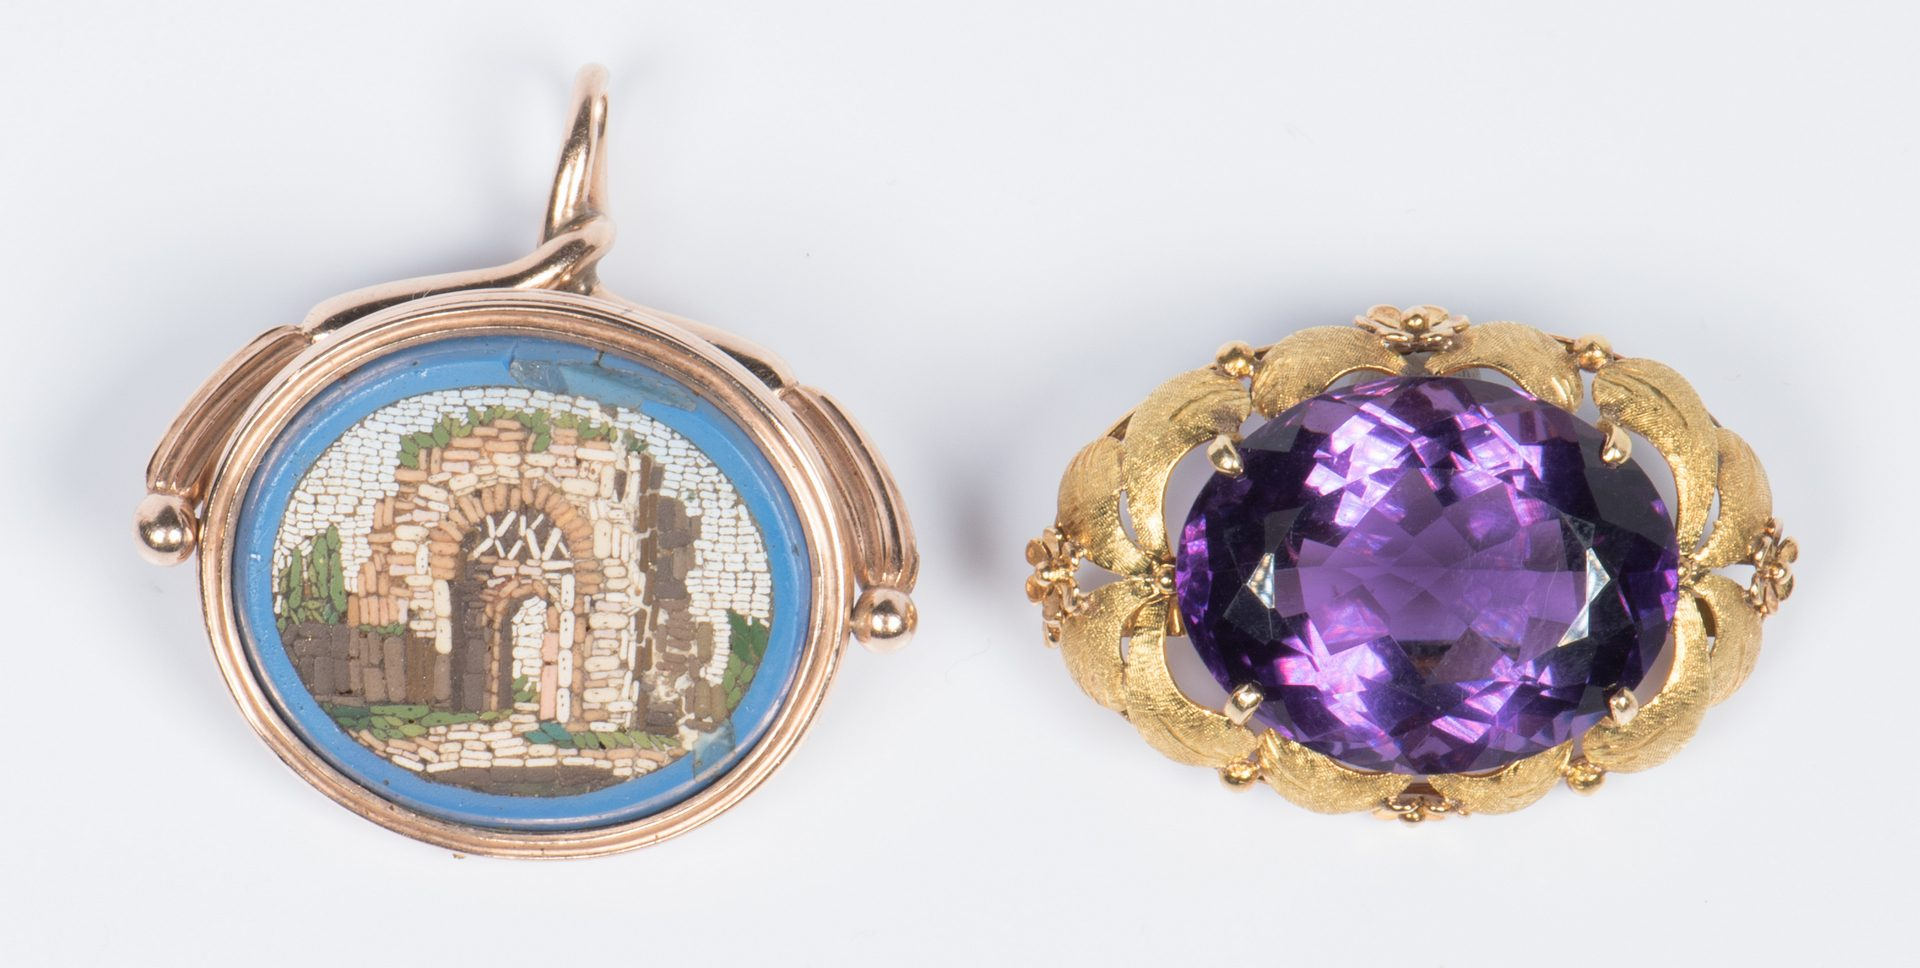 Lot 704: 14K, 10K Vintage style Jewelry